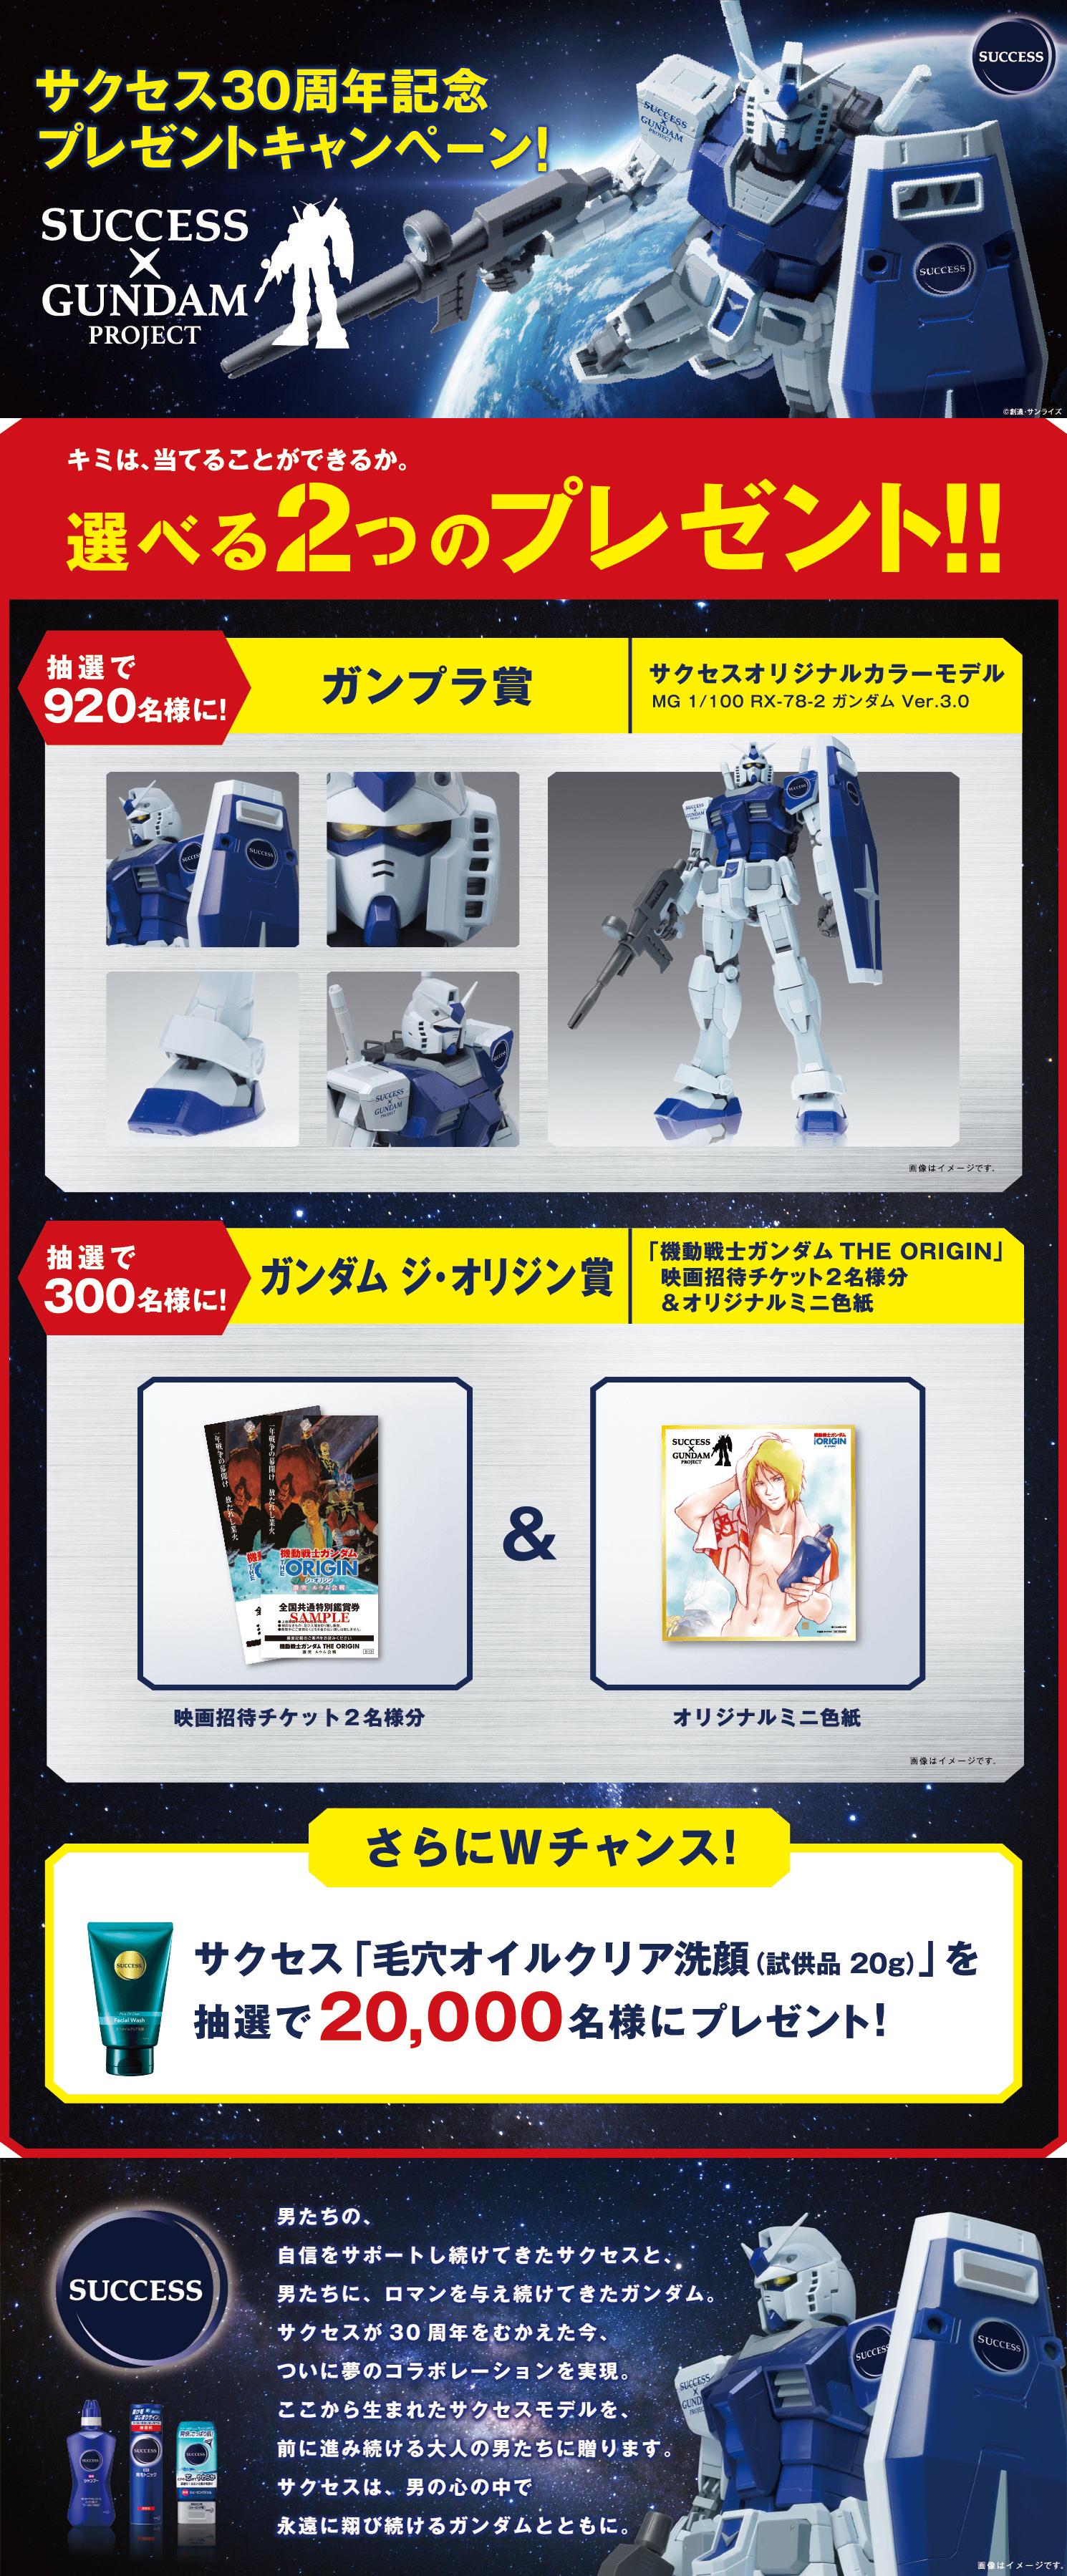 MG 1/100 ガンダム Ver.3.0 サクセスオリジナルカラーモデル [Gundam Ver.3.0 Success Original Color Model] 公式商品説明(画像)